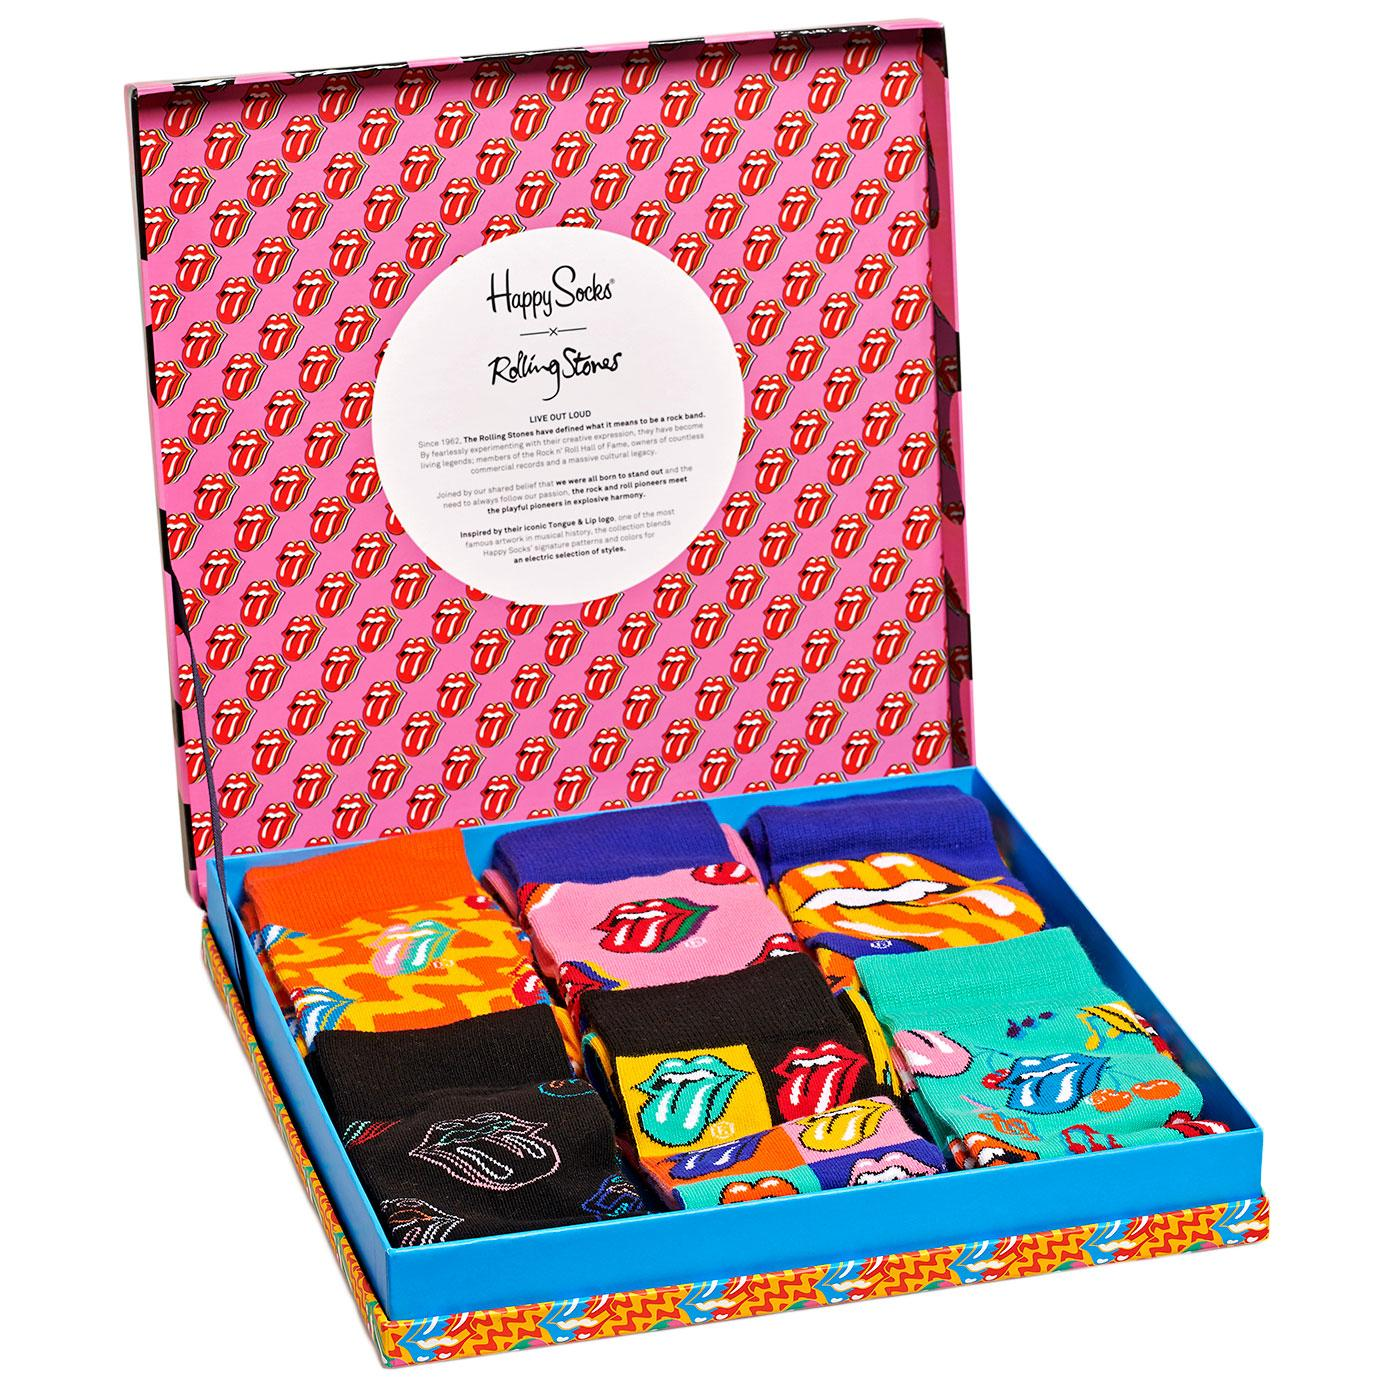 + HAPPY SOCKS x ROLLING STONES 6 Sock Gift Box